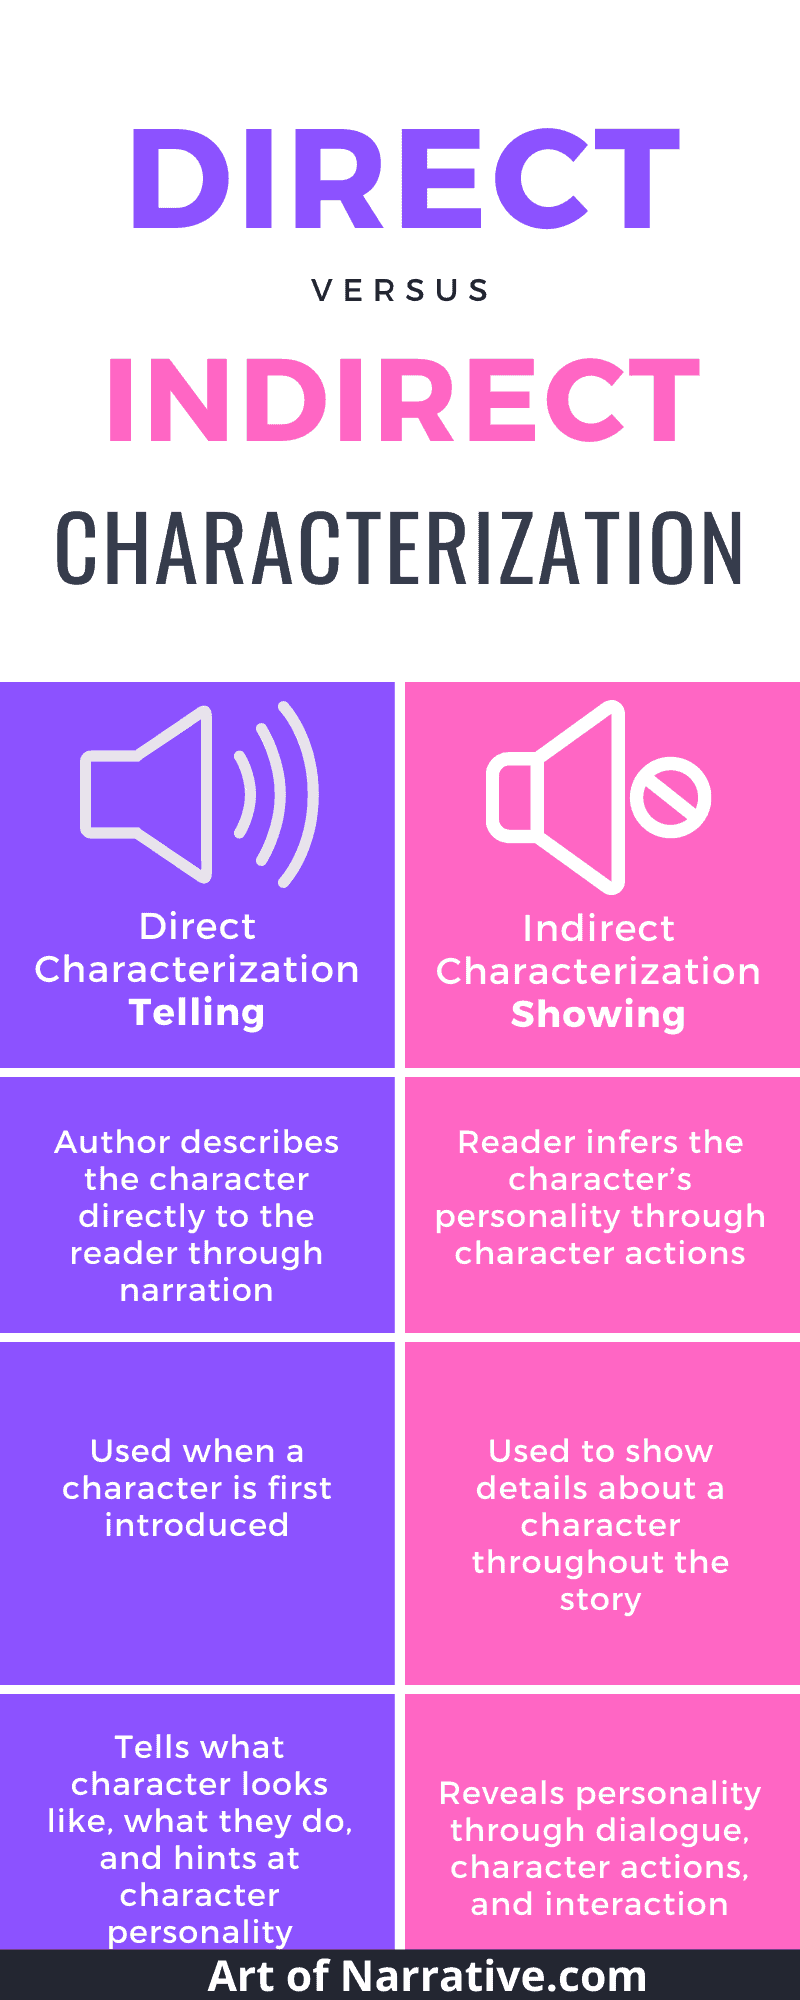 Direct Characterization Vs. Indirect Characterization - The Art of Narrative